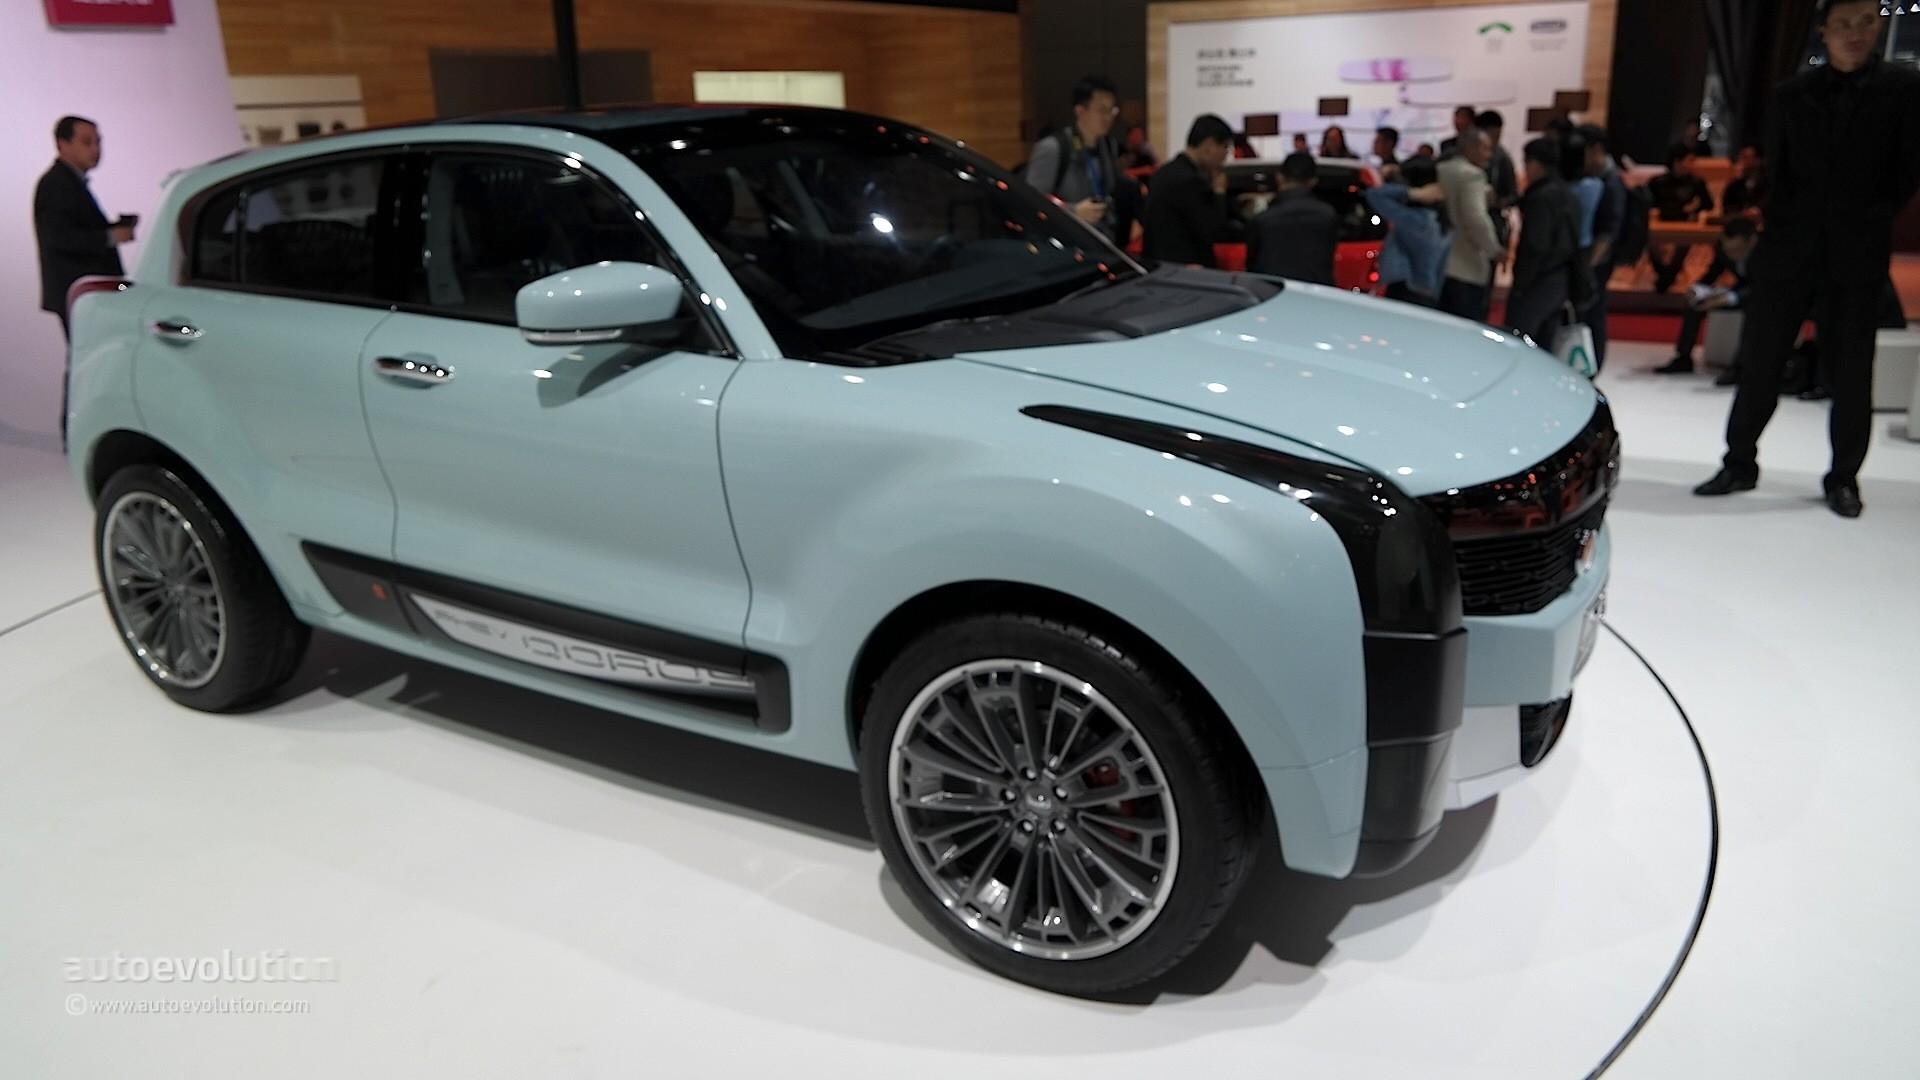 Qoros Hybrid Crossover Concept Looks Like A Cadillac Nissan Gt R Mix In Shanghai Live Photos on Cadillac 3 6 Engine